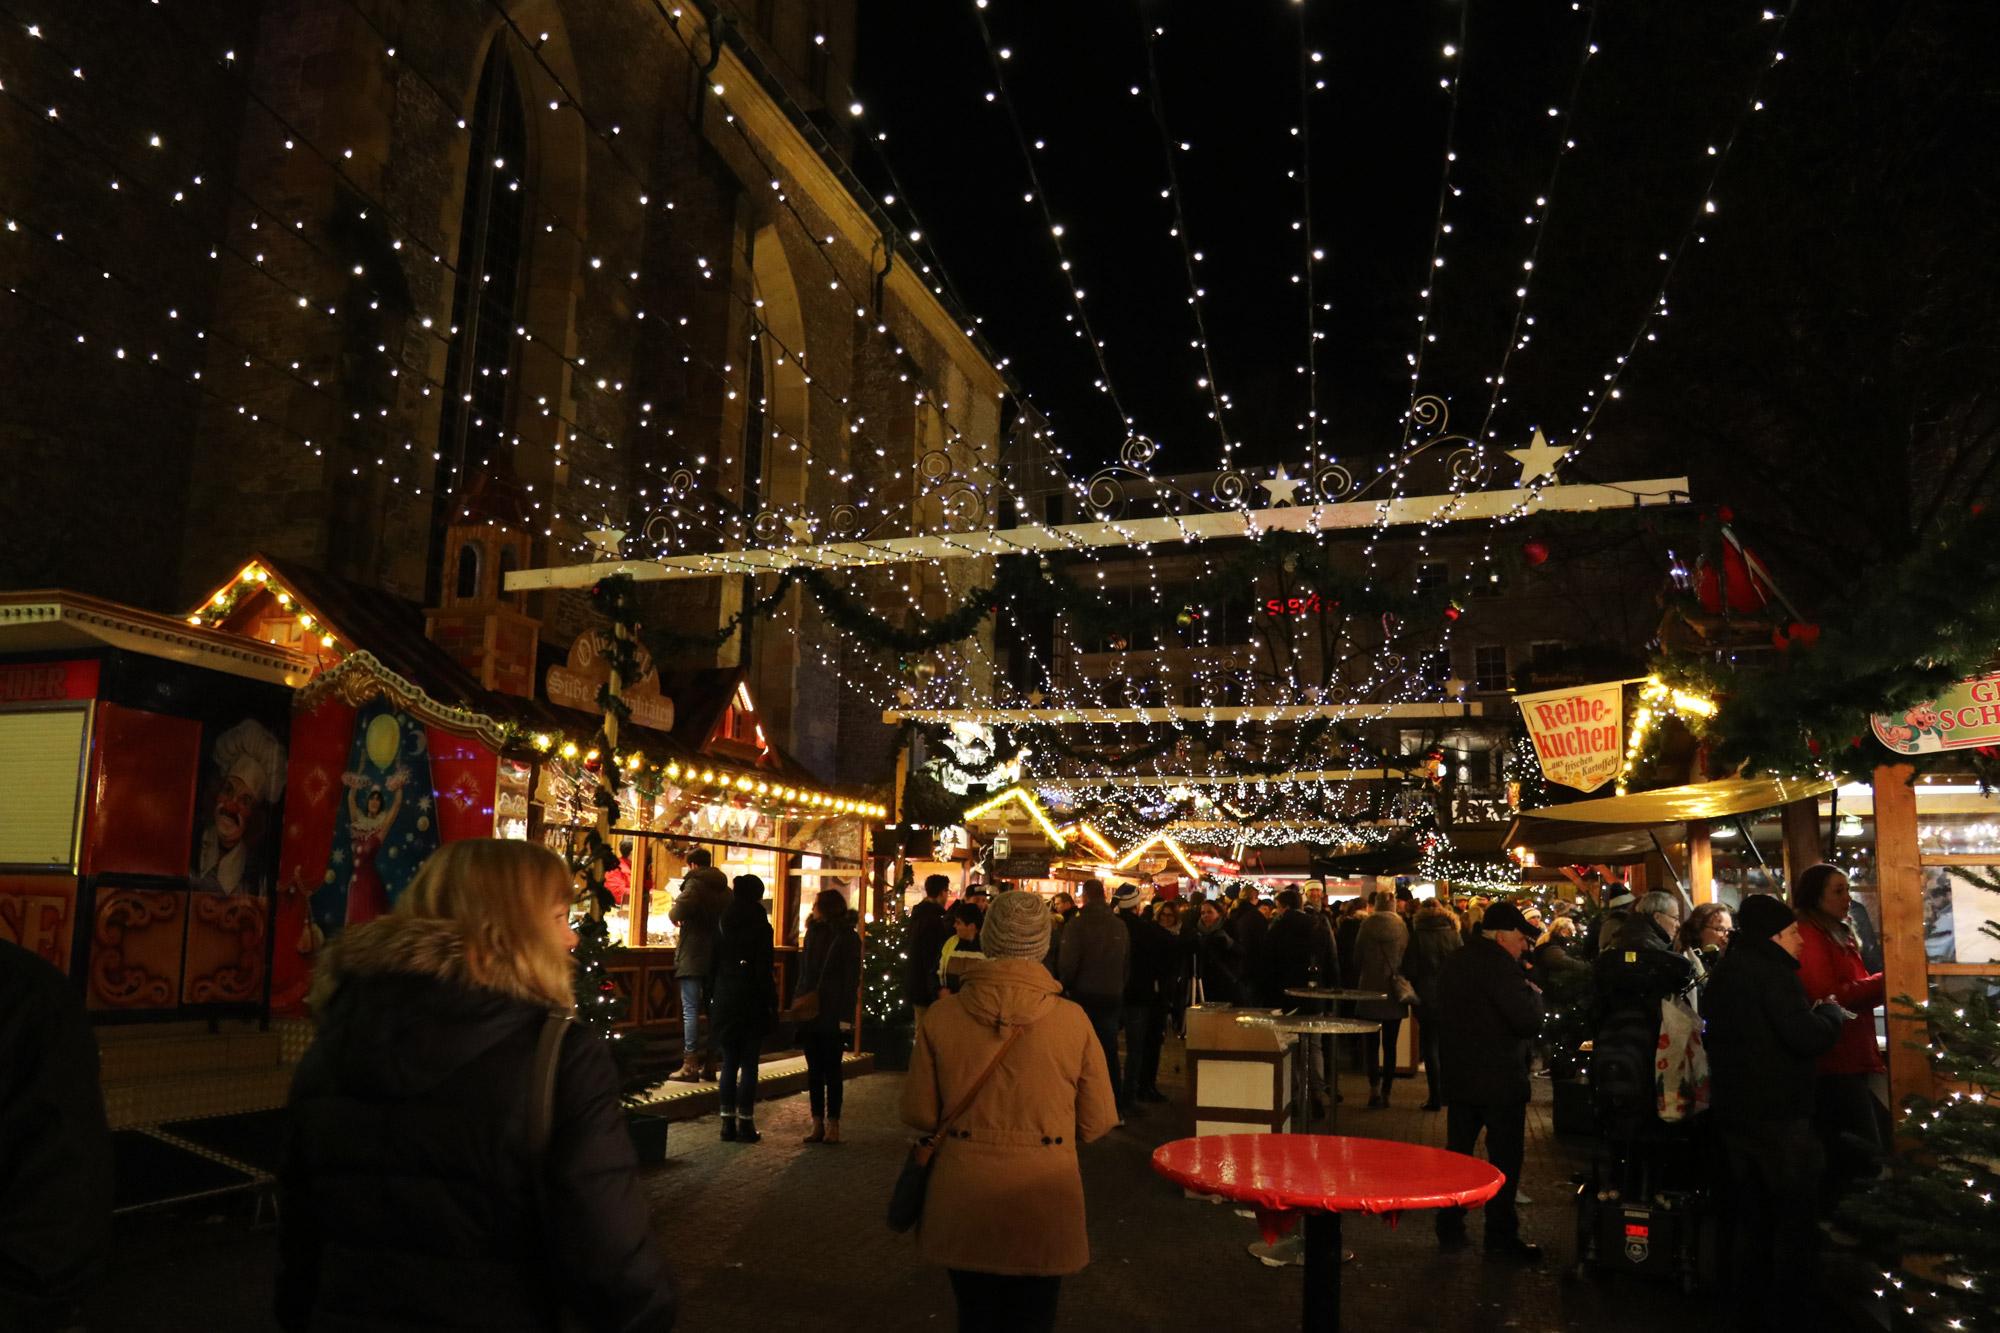 Bielefeld kerstmarkt - Rathaus